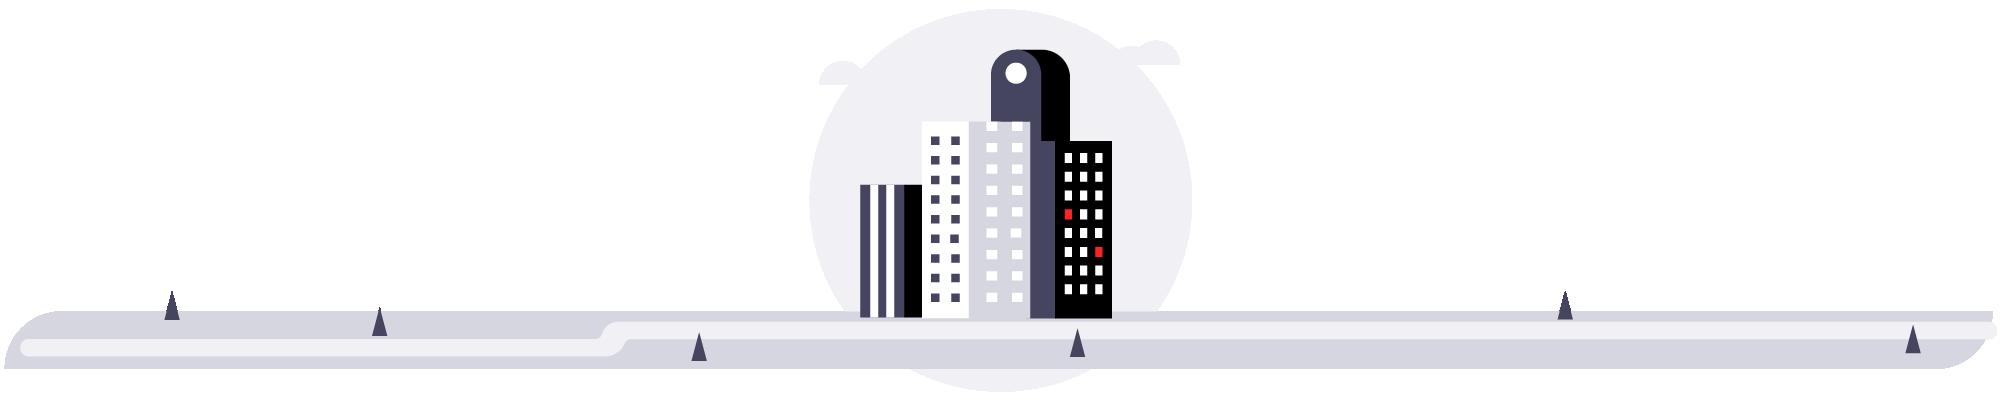 city-long-4.png